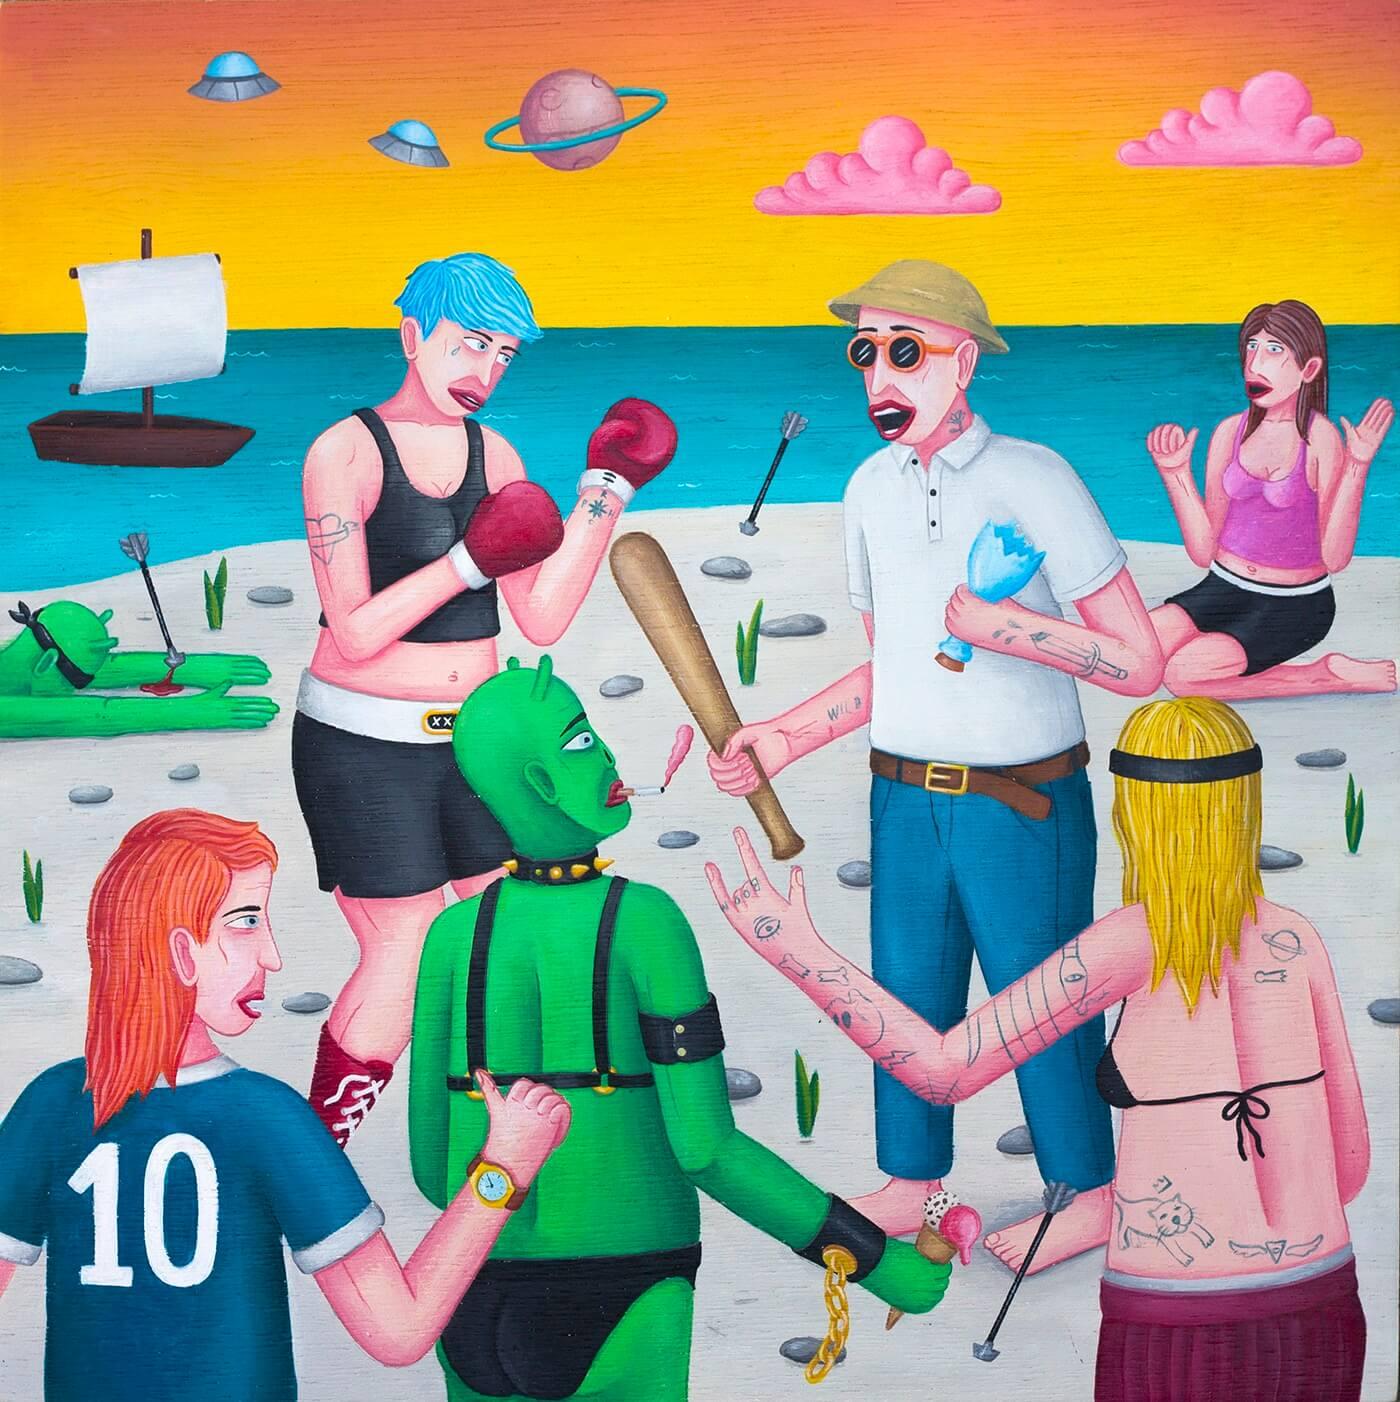 丁丁藝術空間(Ting Ting Art Gallery)Cane 《Box On the Beach》